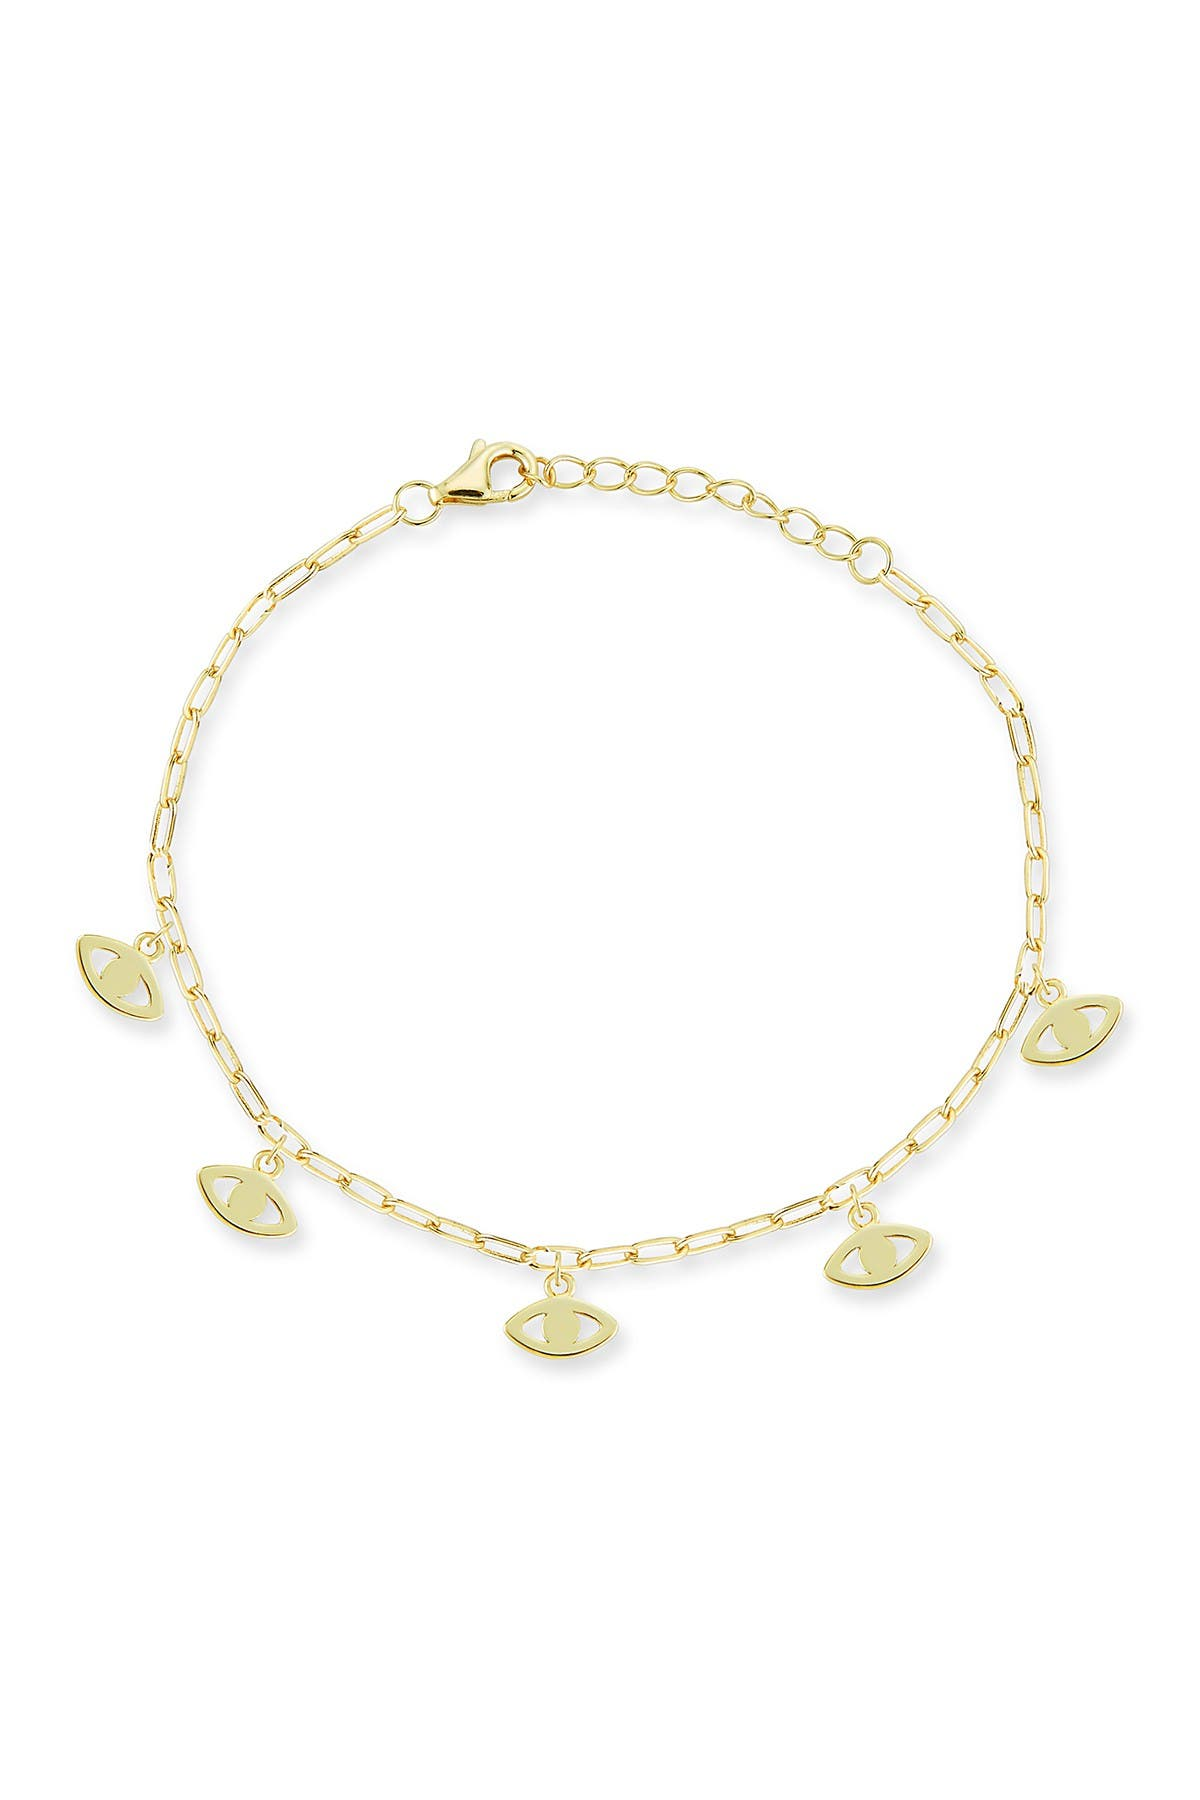 Image of Sphera Milano 14K Gold Plated Sterling Silver Evil Eye Charm Bracelet